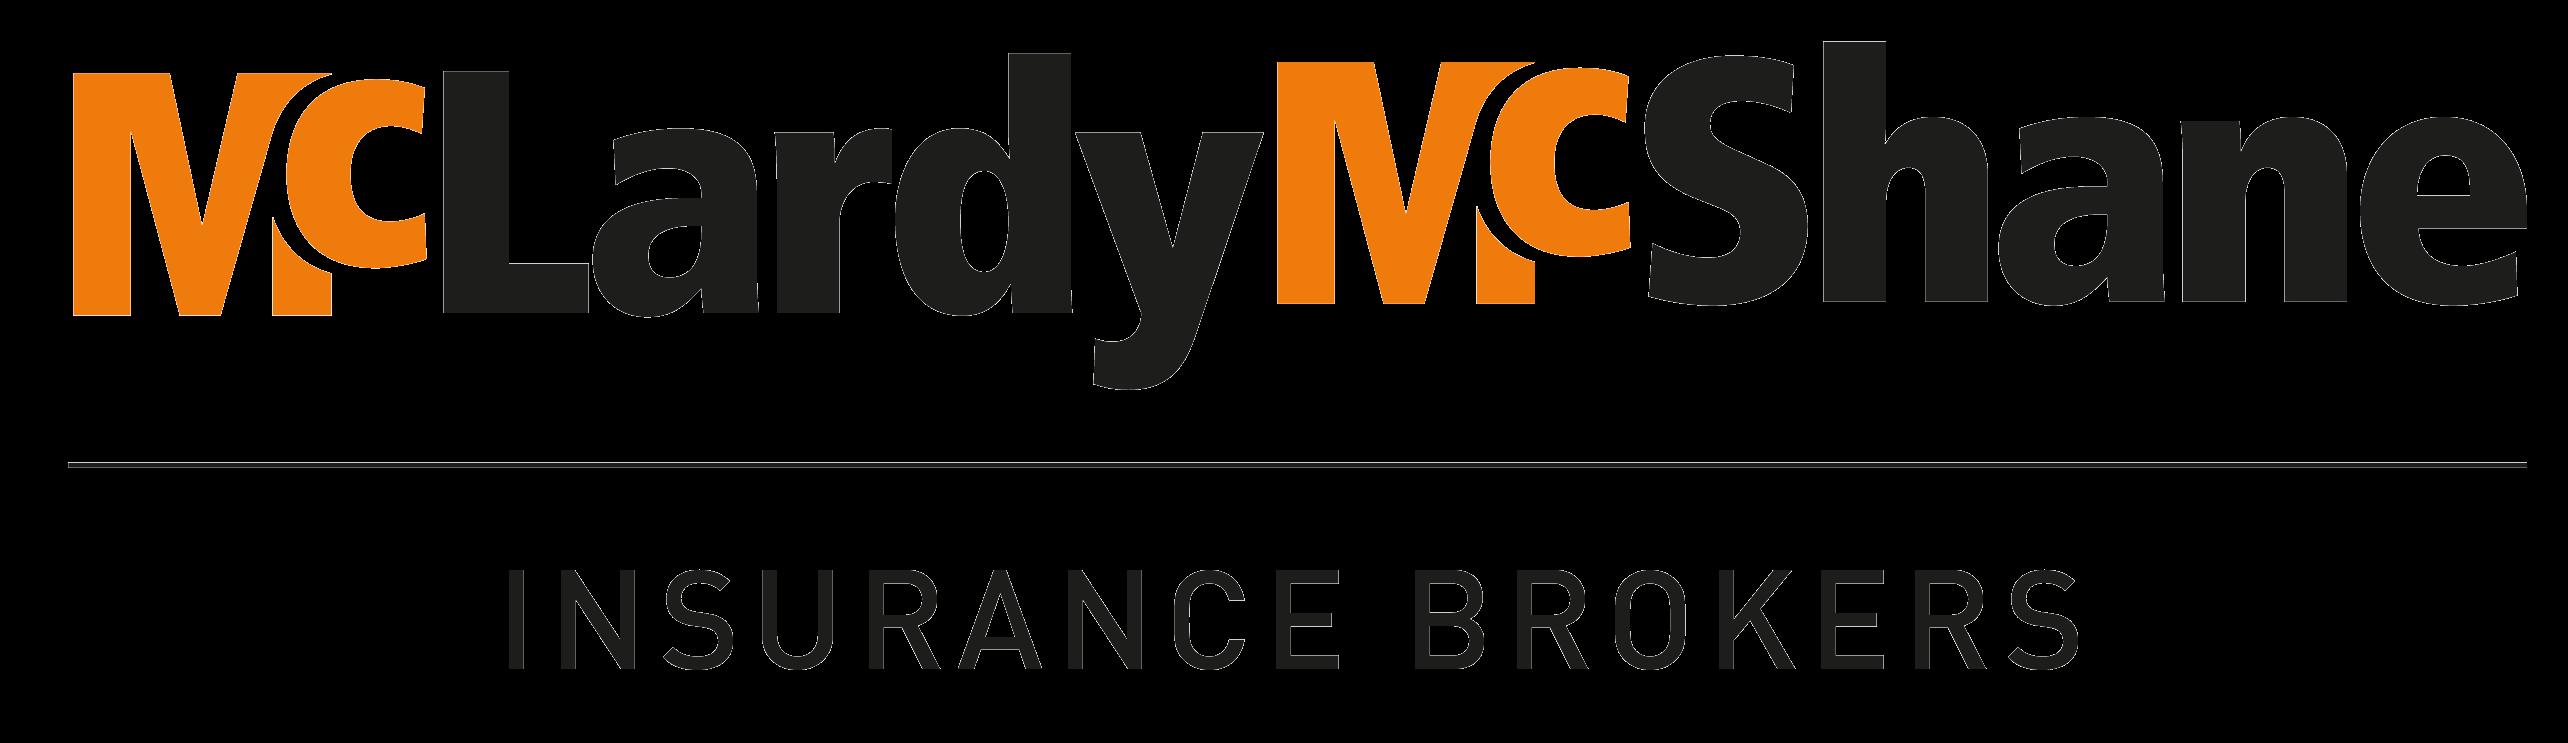 McLardy McShane Insurance Brokers